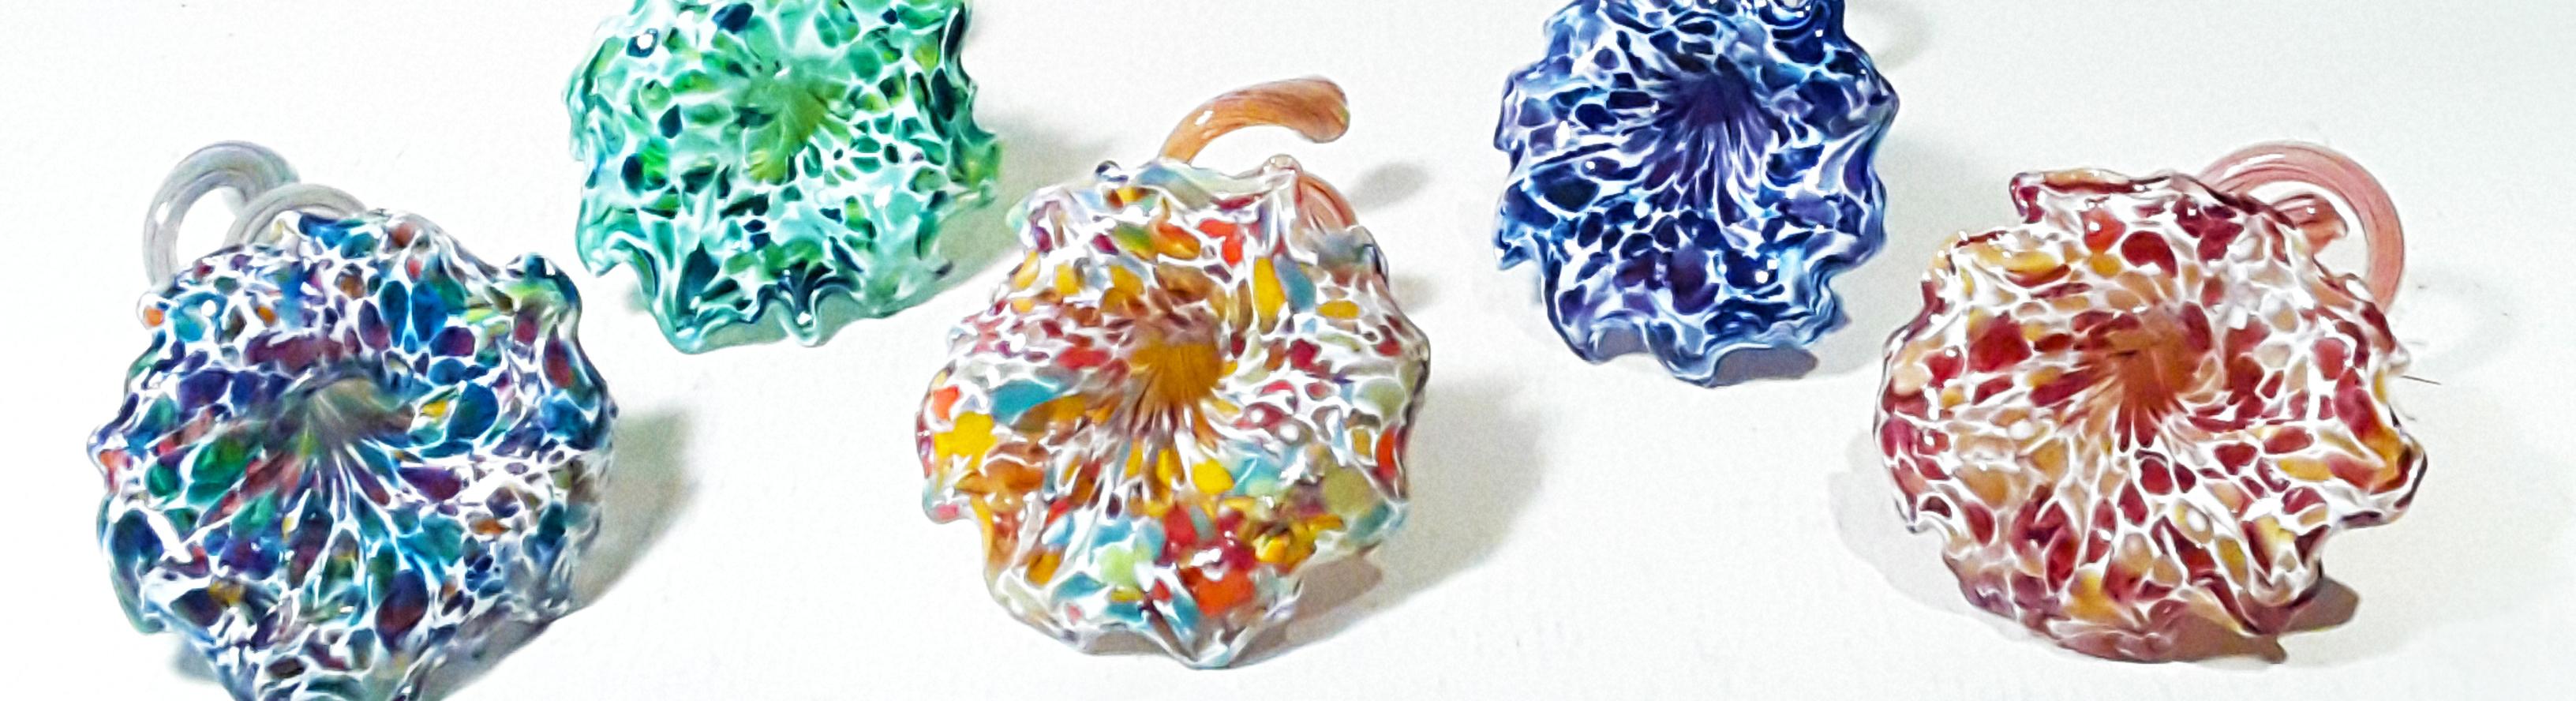 SSlider-Help-Create-Flowers-2017